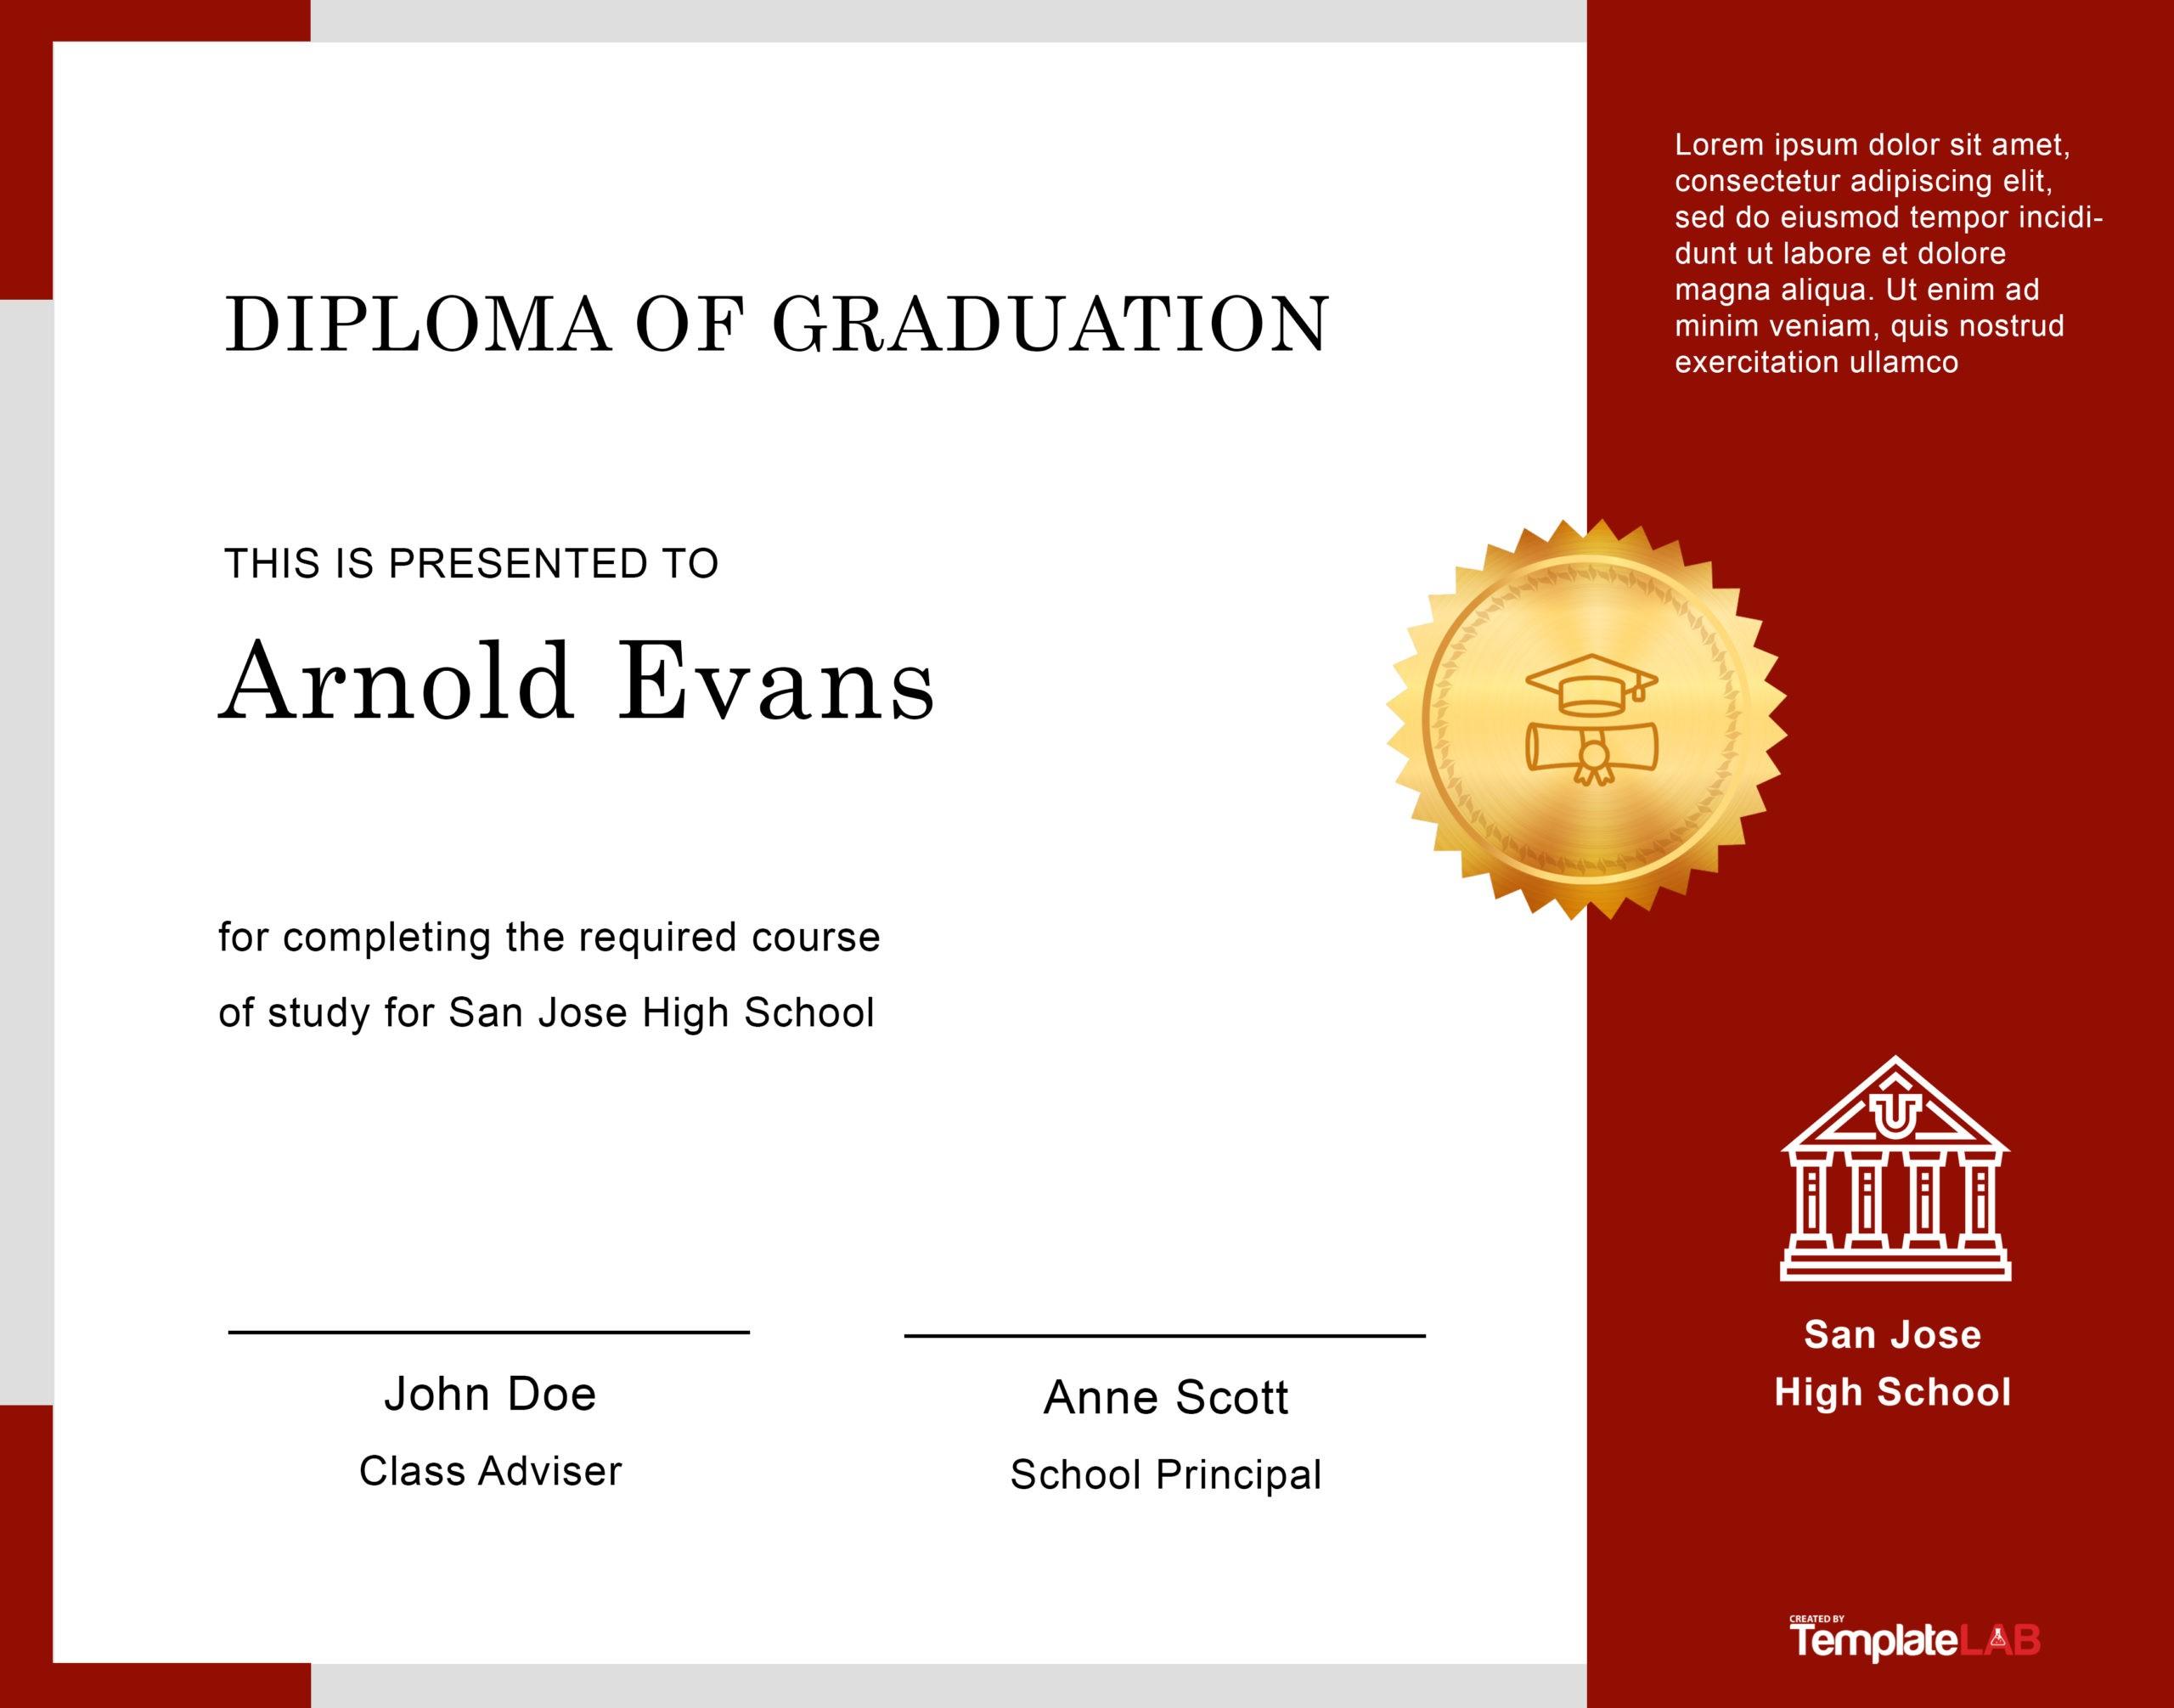 Free Diploma Template 15 - TemplateLab.com